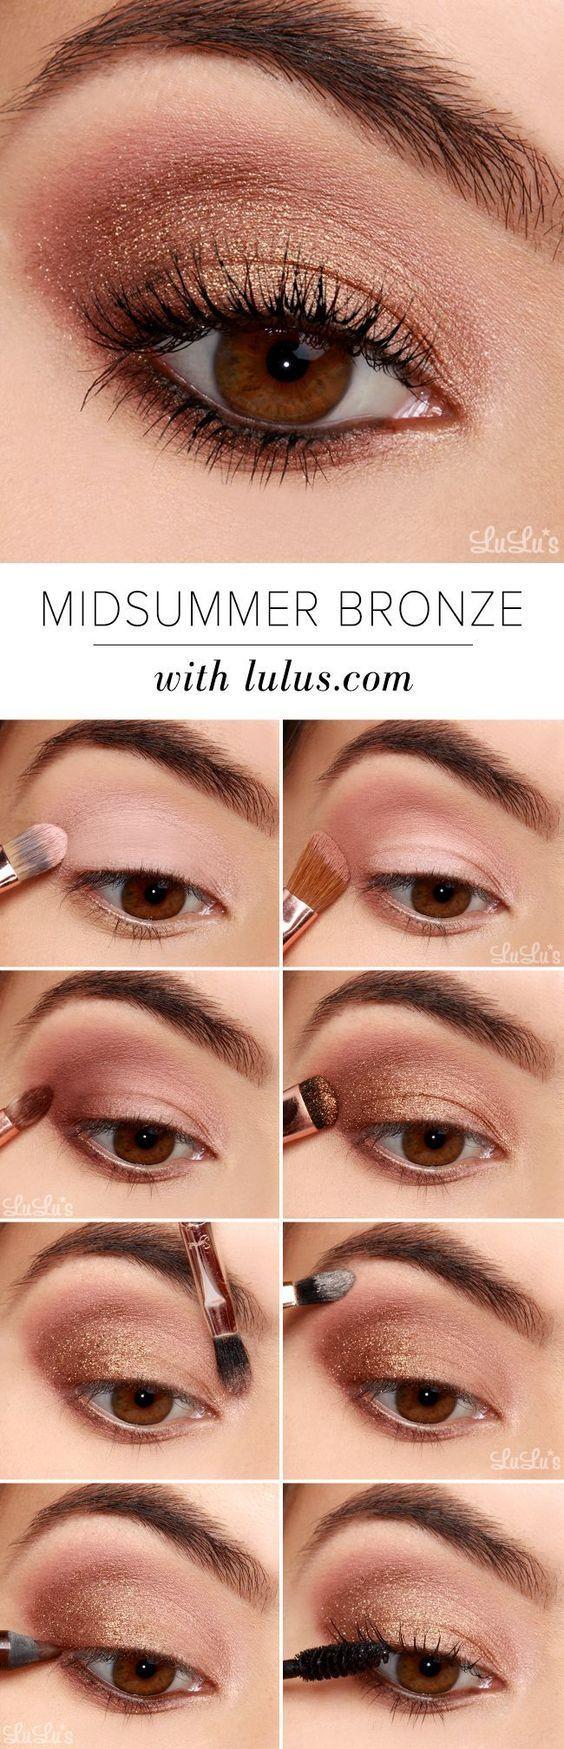 20 easy step by step eyeshadow tutorials for beginners | makeup